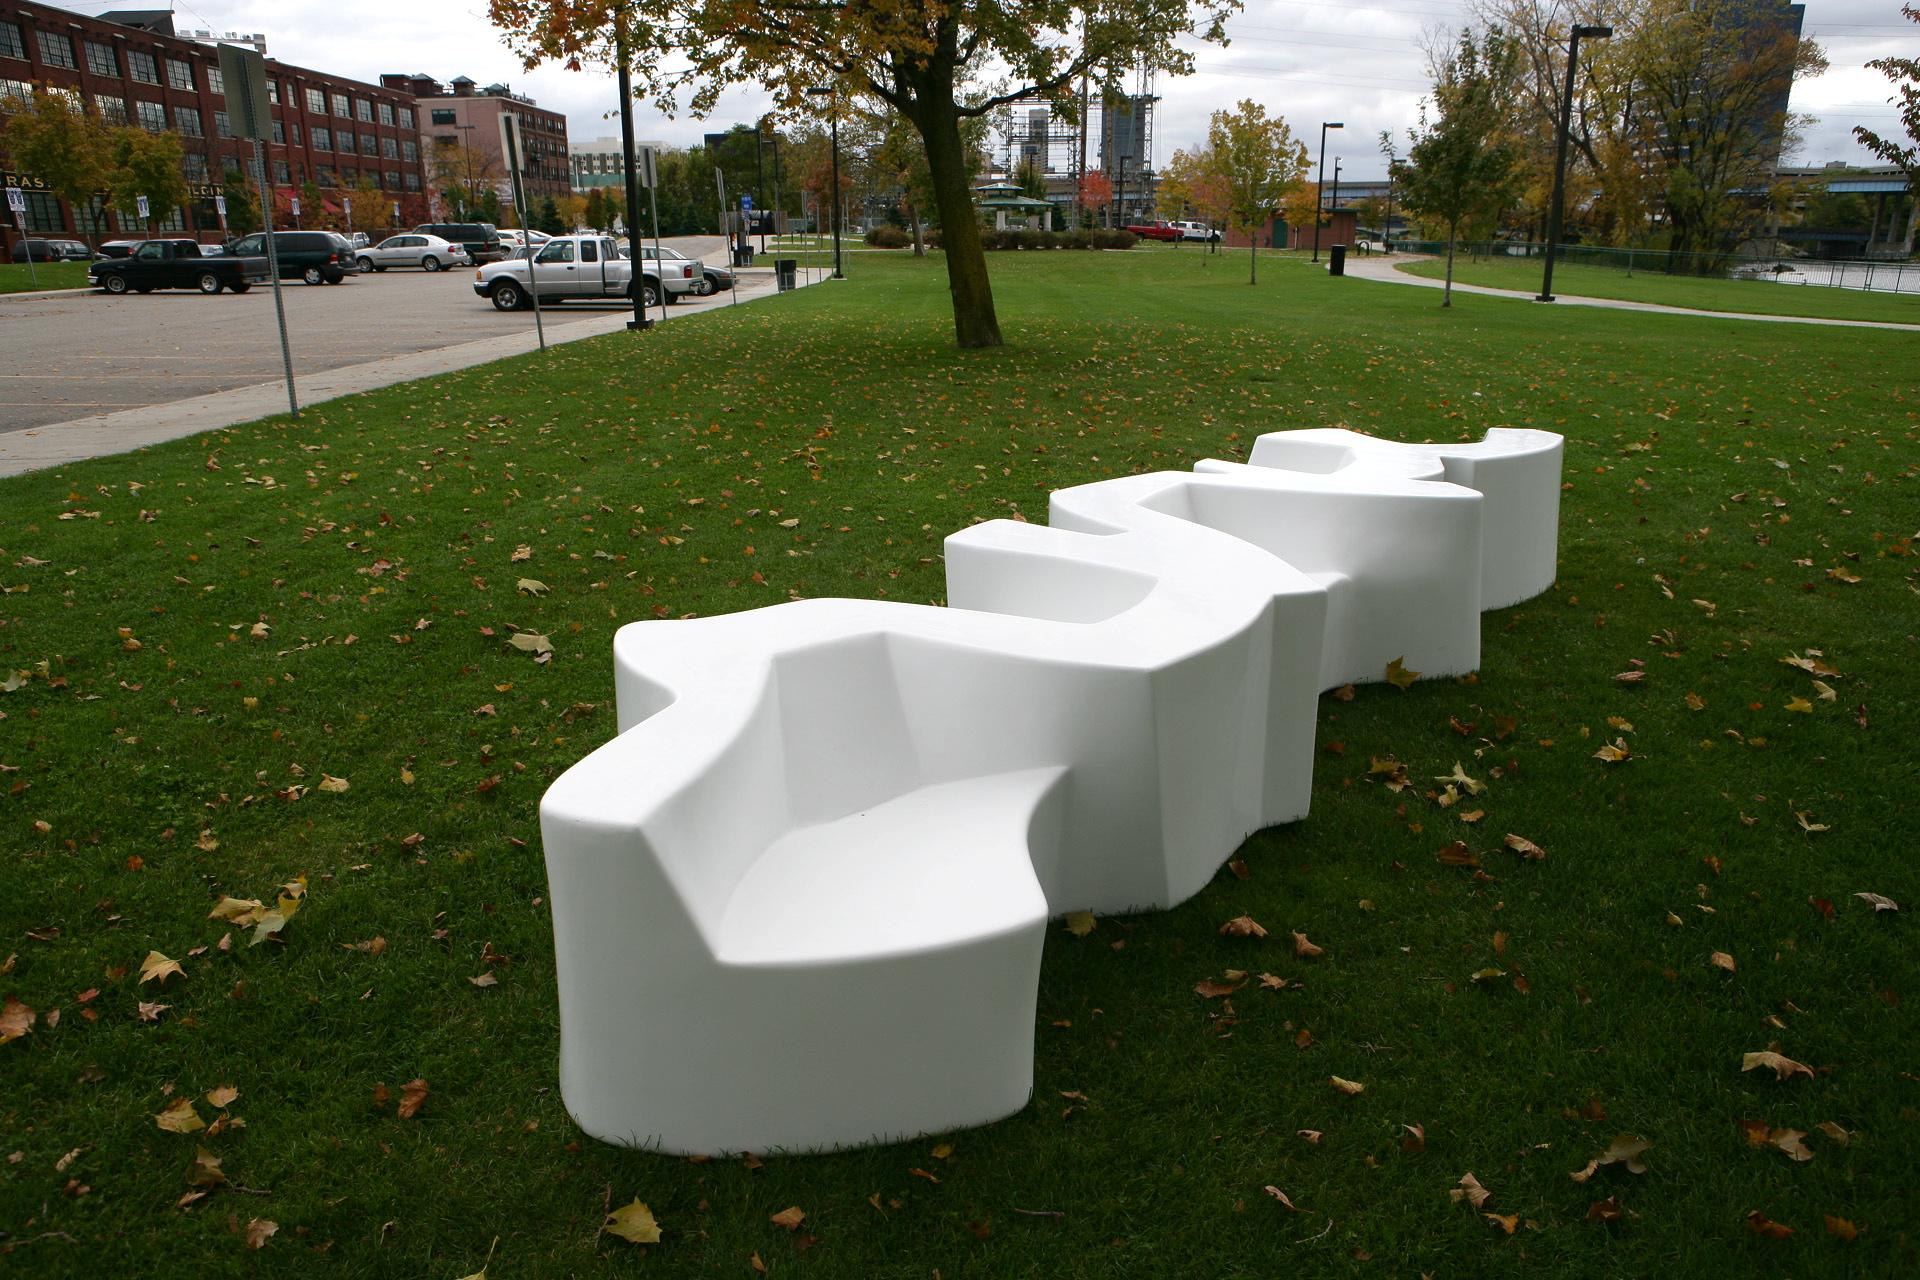 Public Furniture By Cameron Van Dyke At Coroflot Com